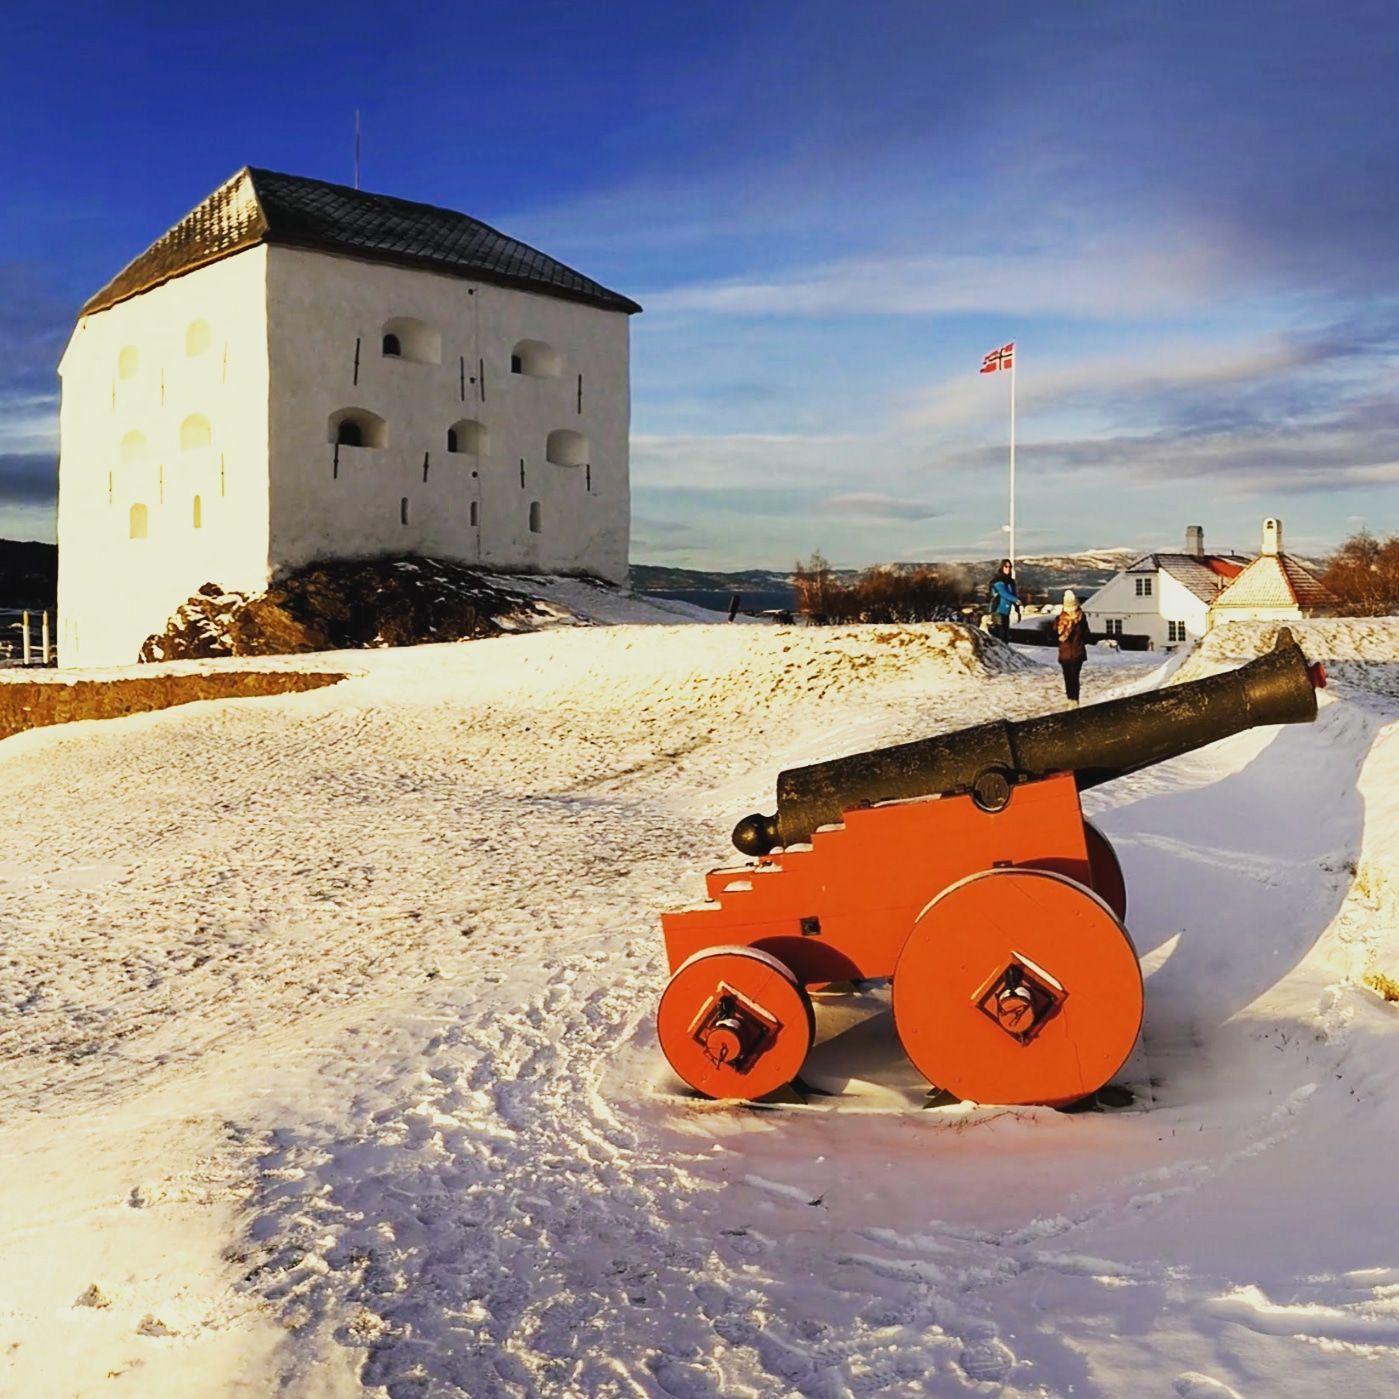 Fortress Trondheim